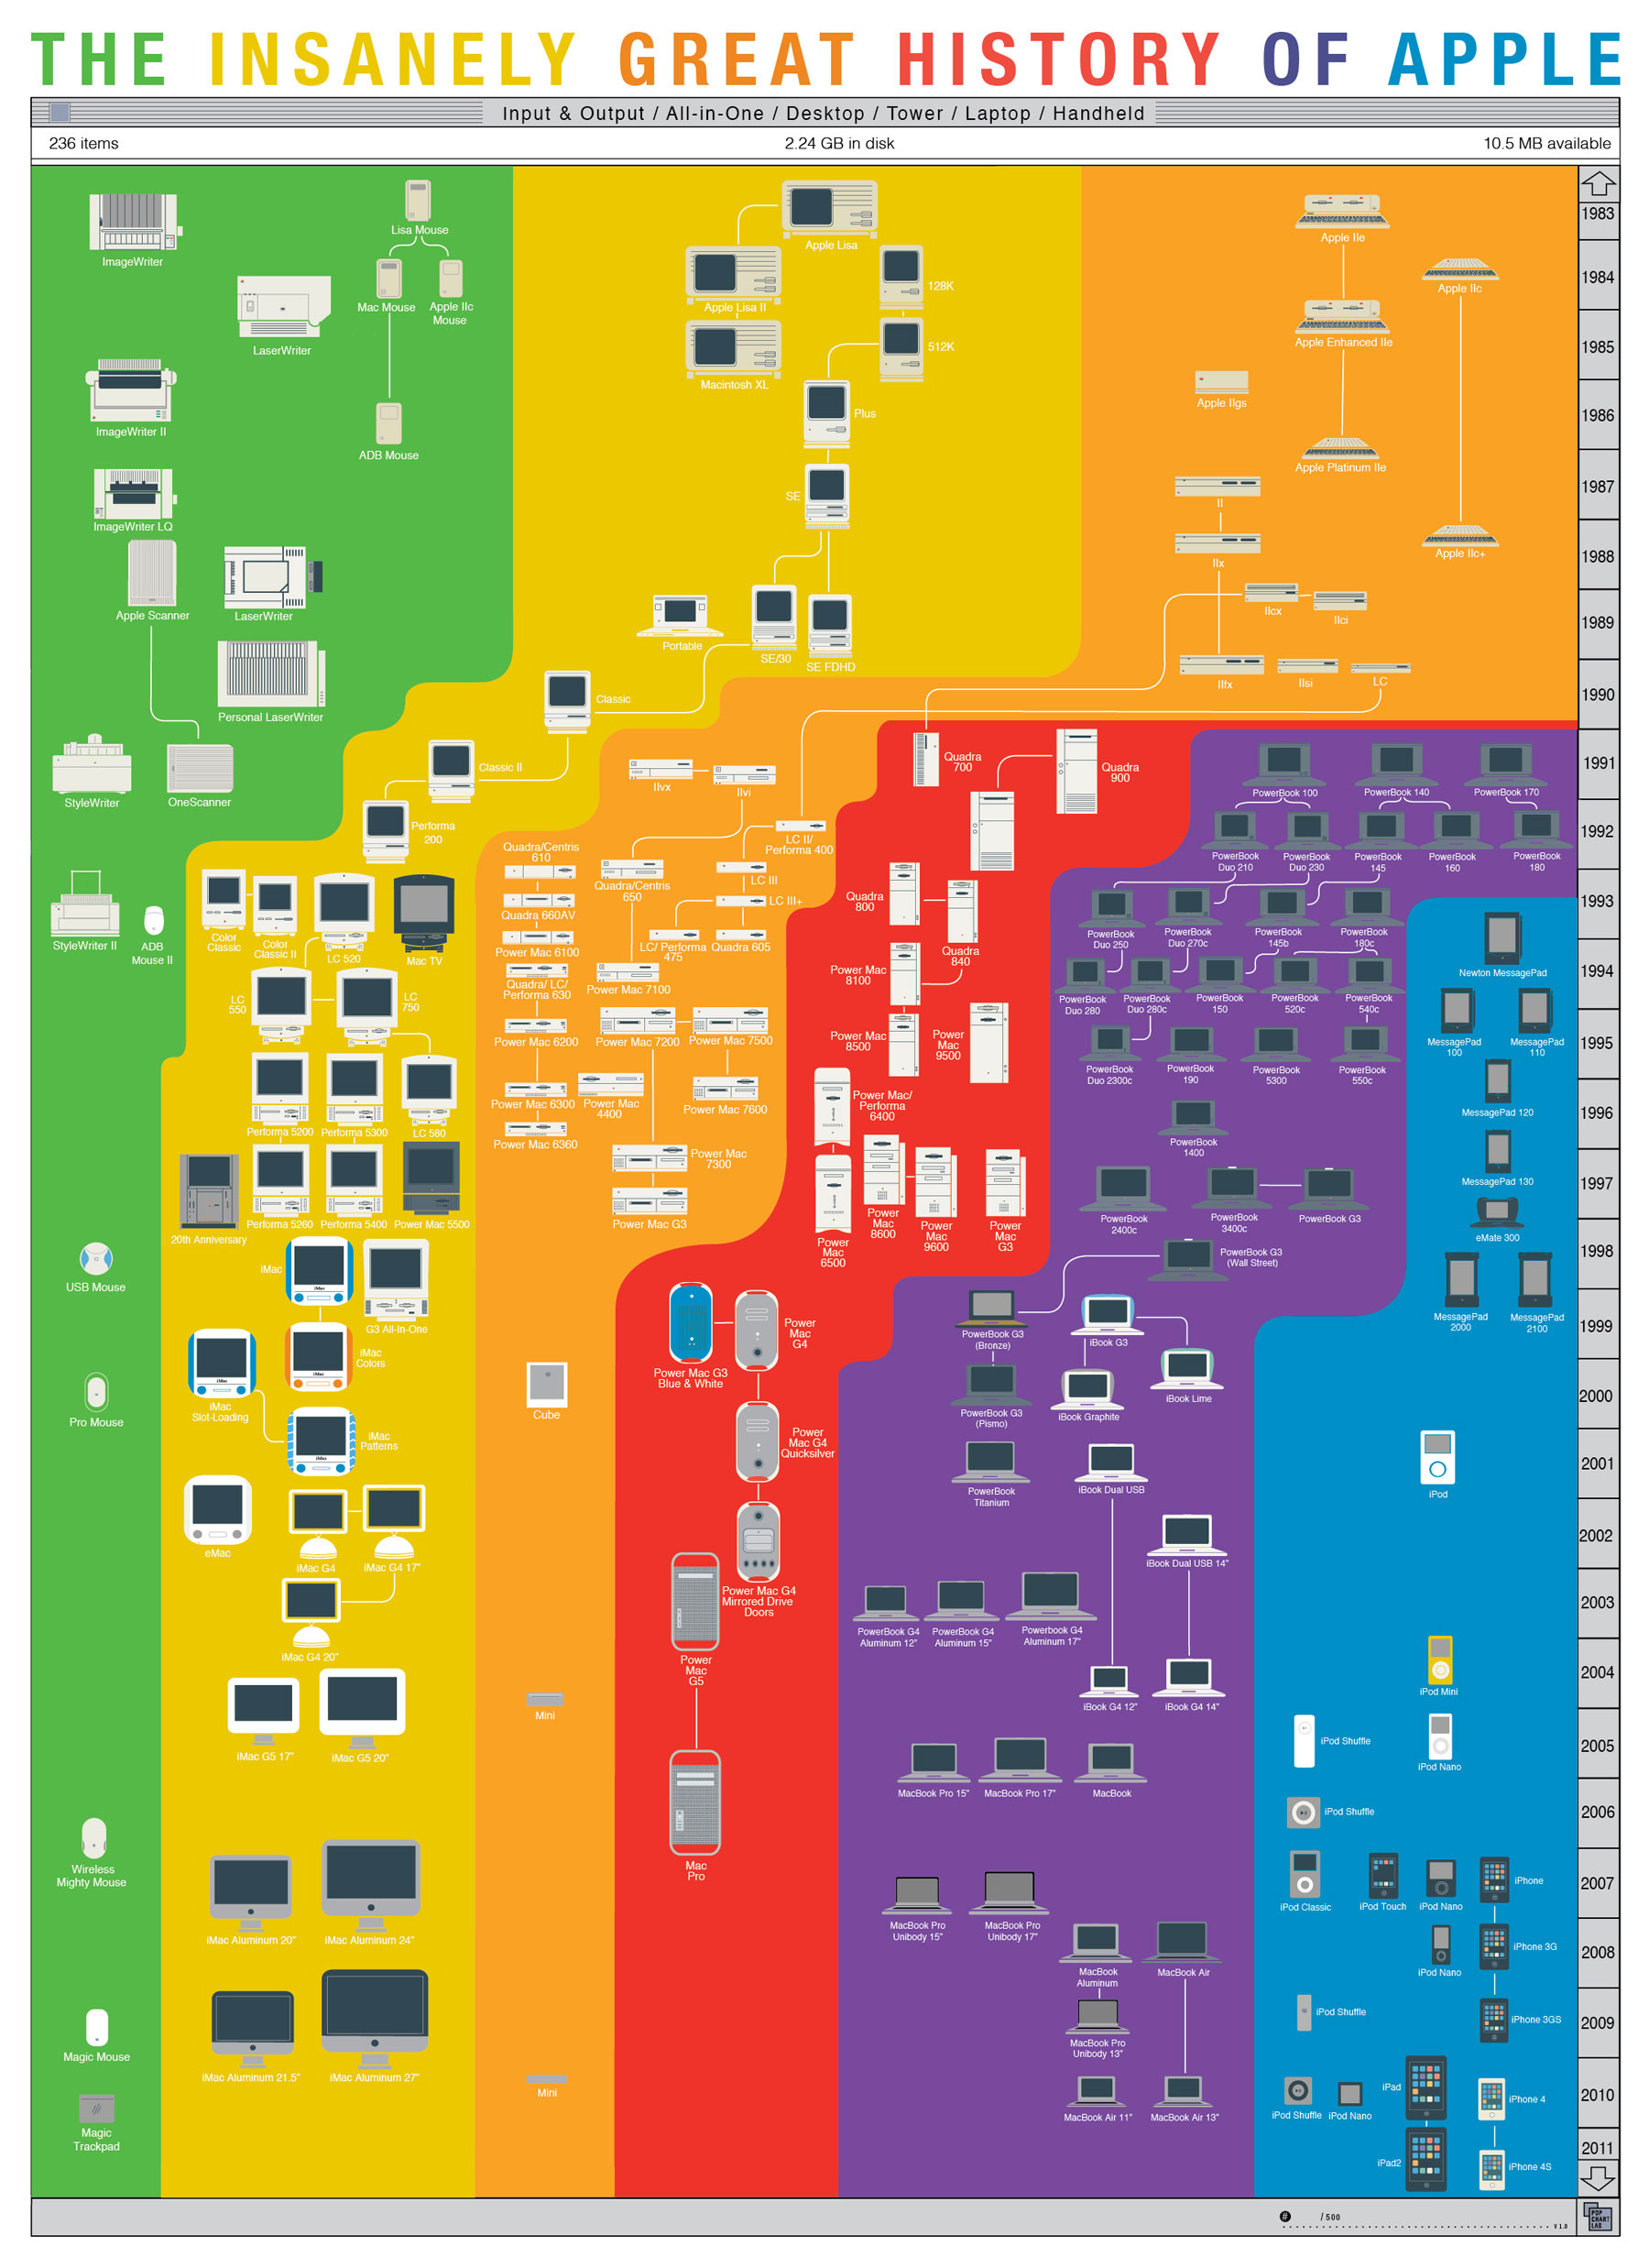 http://mashable.com/2012/10/05/apple-history-chart/